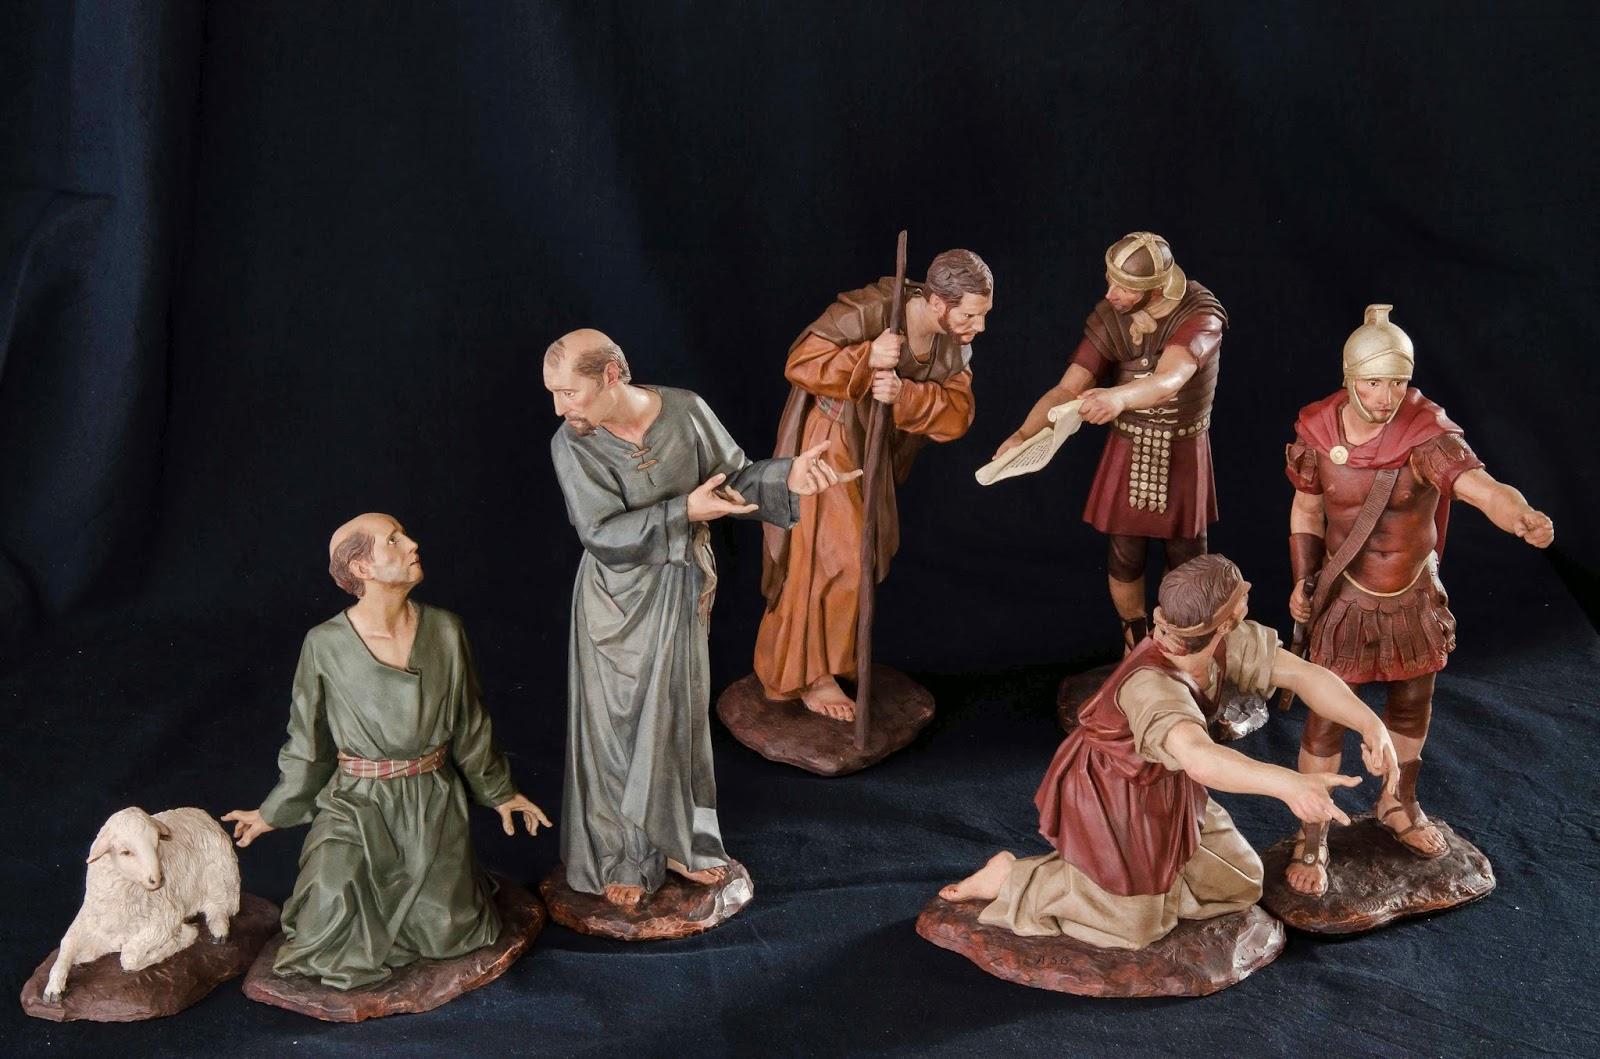 Belén presepe nativity krippe Arturo Serra escultura barro cocido 11